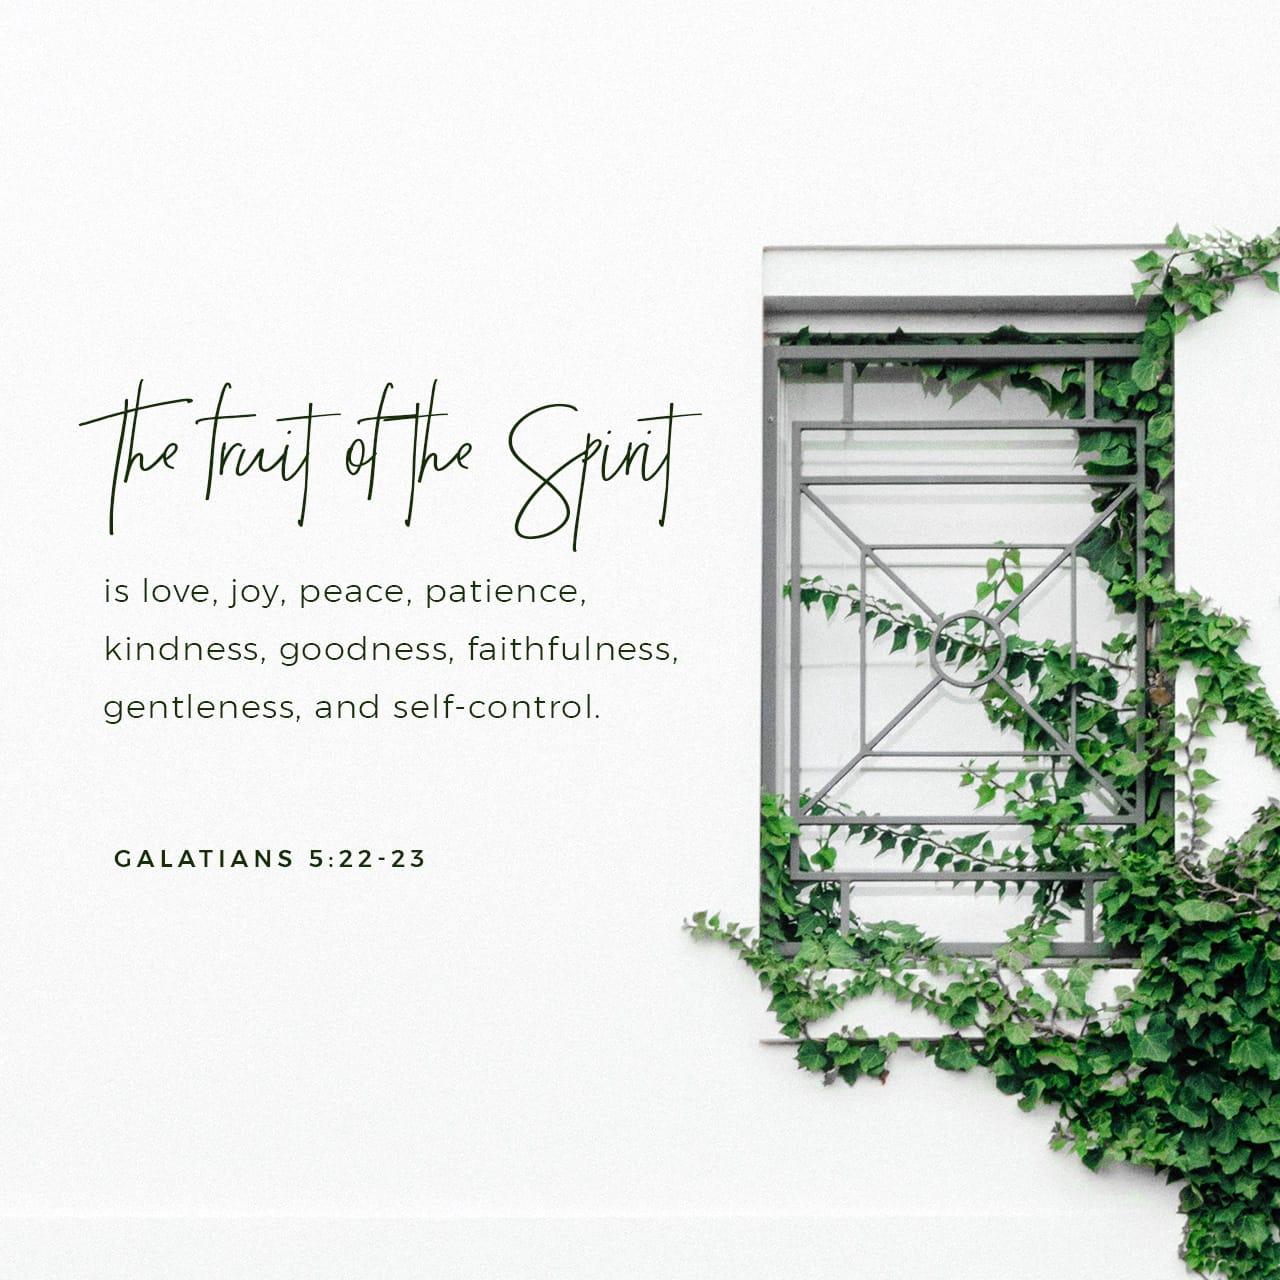 Galatians 5:22 But the fruit of the Spirit is love, joy, peace, forbearance, kindness, goodness, faithfulness | New International Version (NIV)